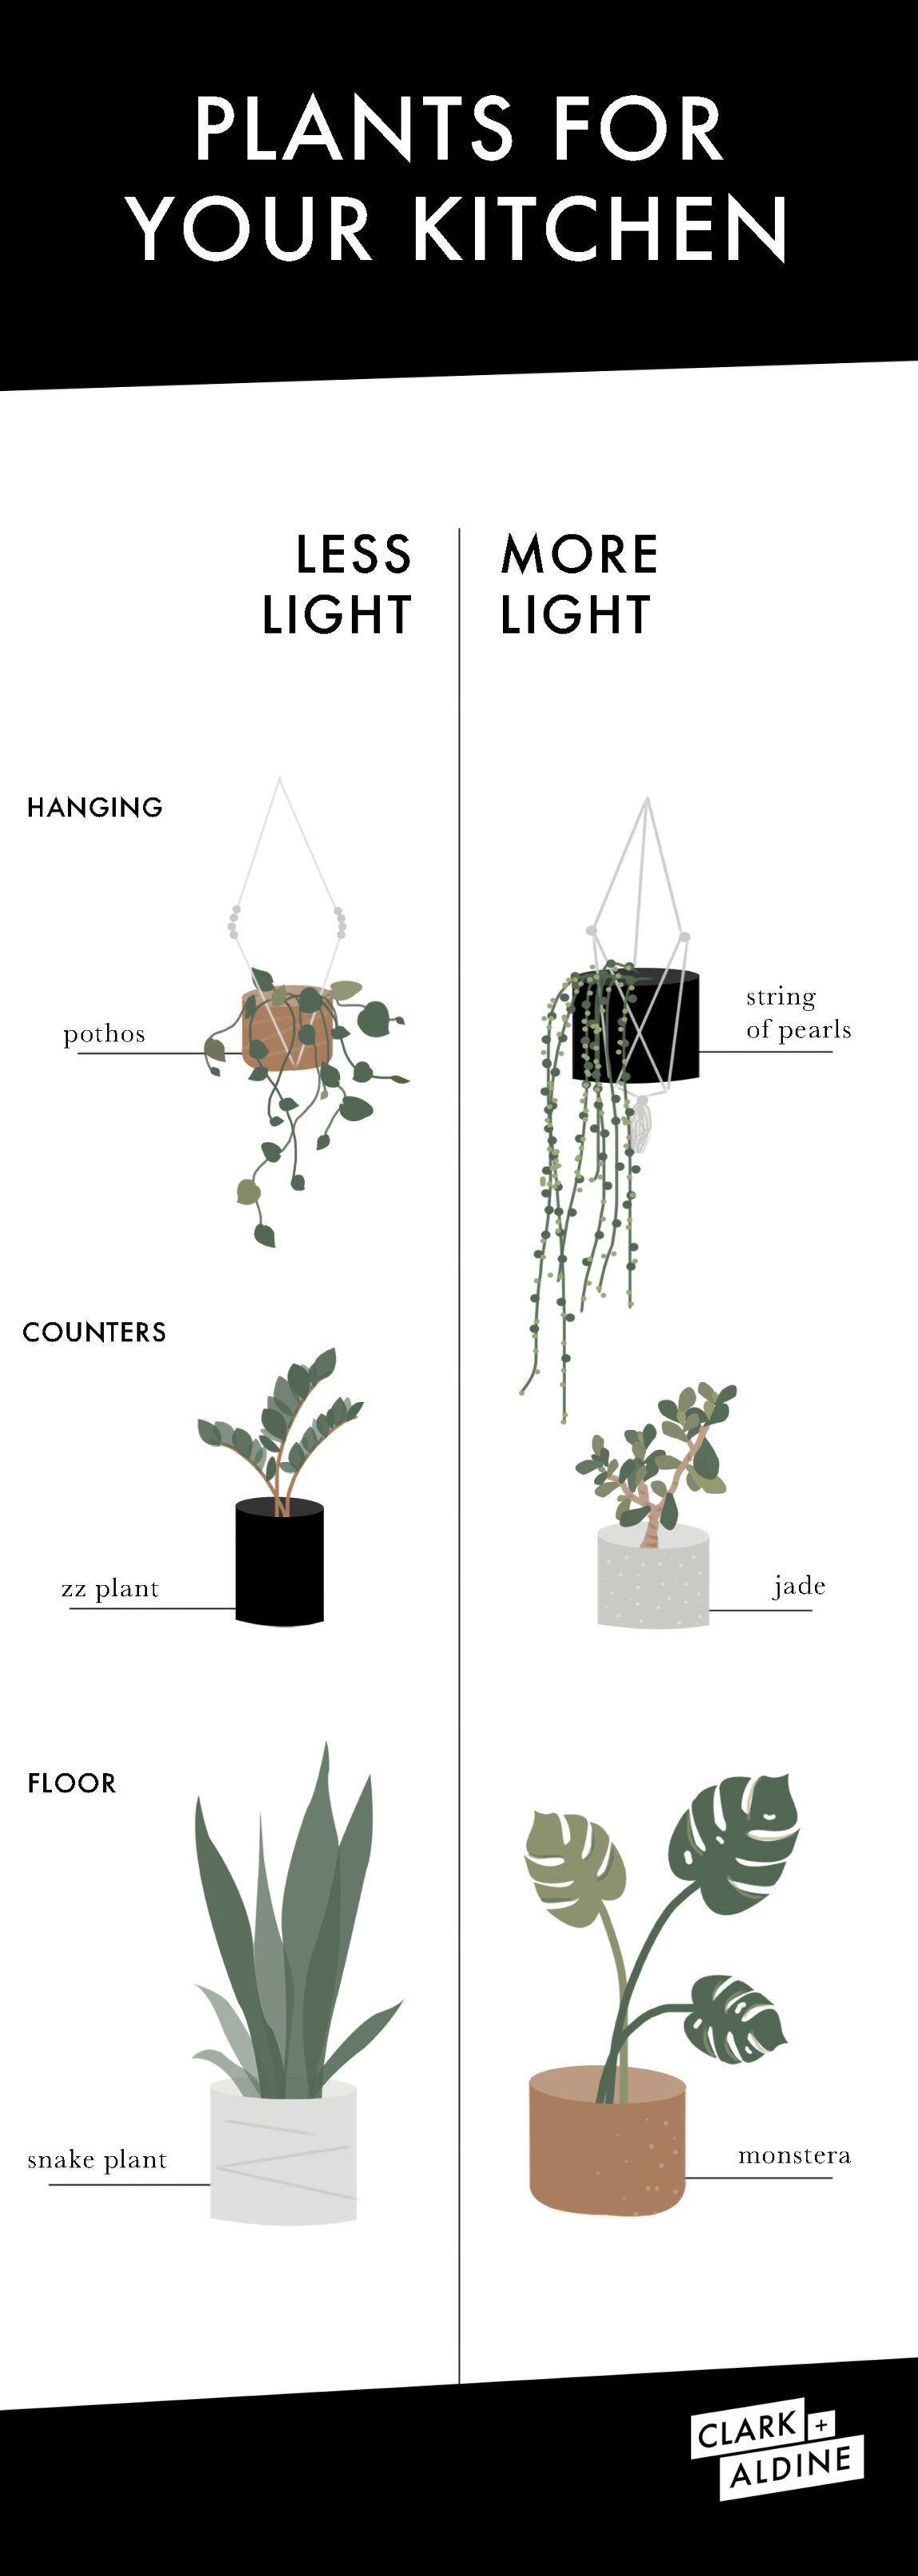 KITCHEN PLANTS EVEN YOU WON'T KILL - CLARK + ALDINE